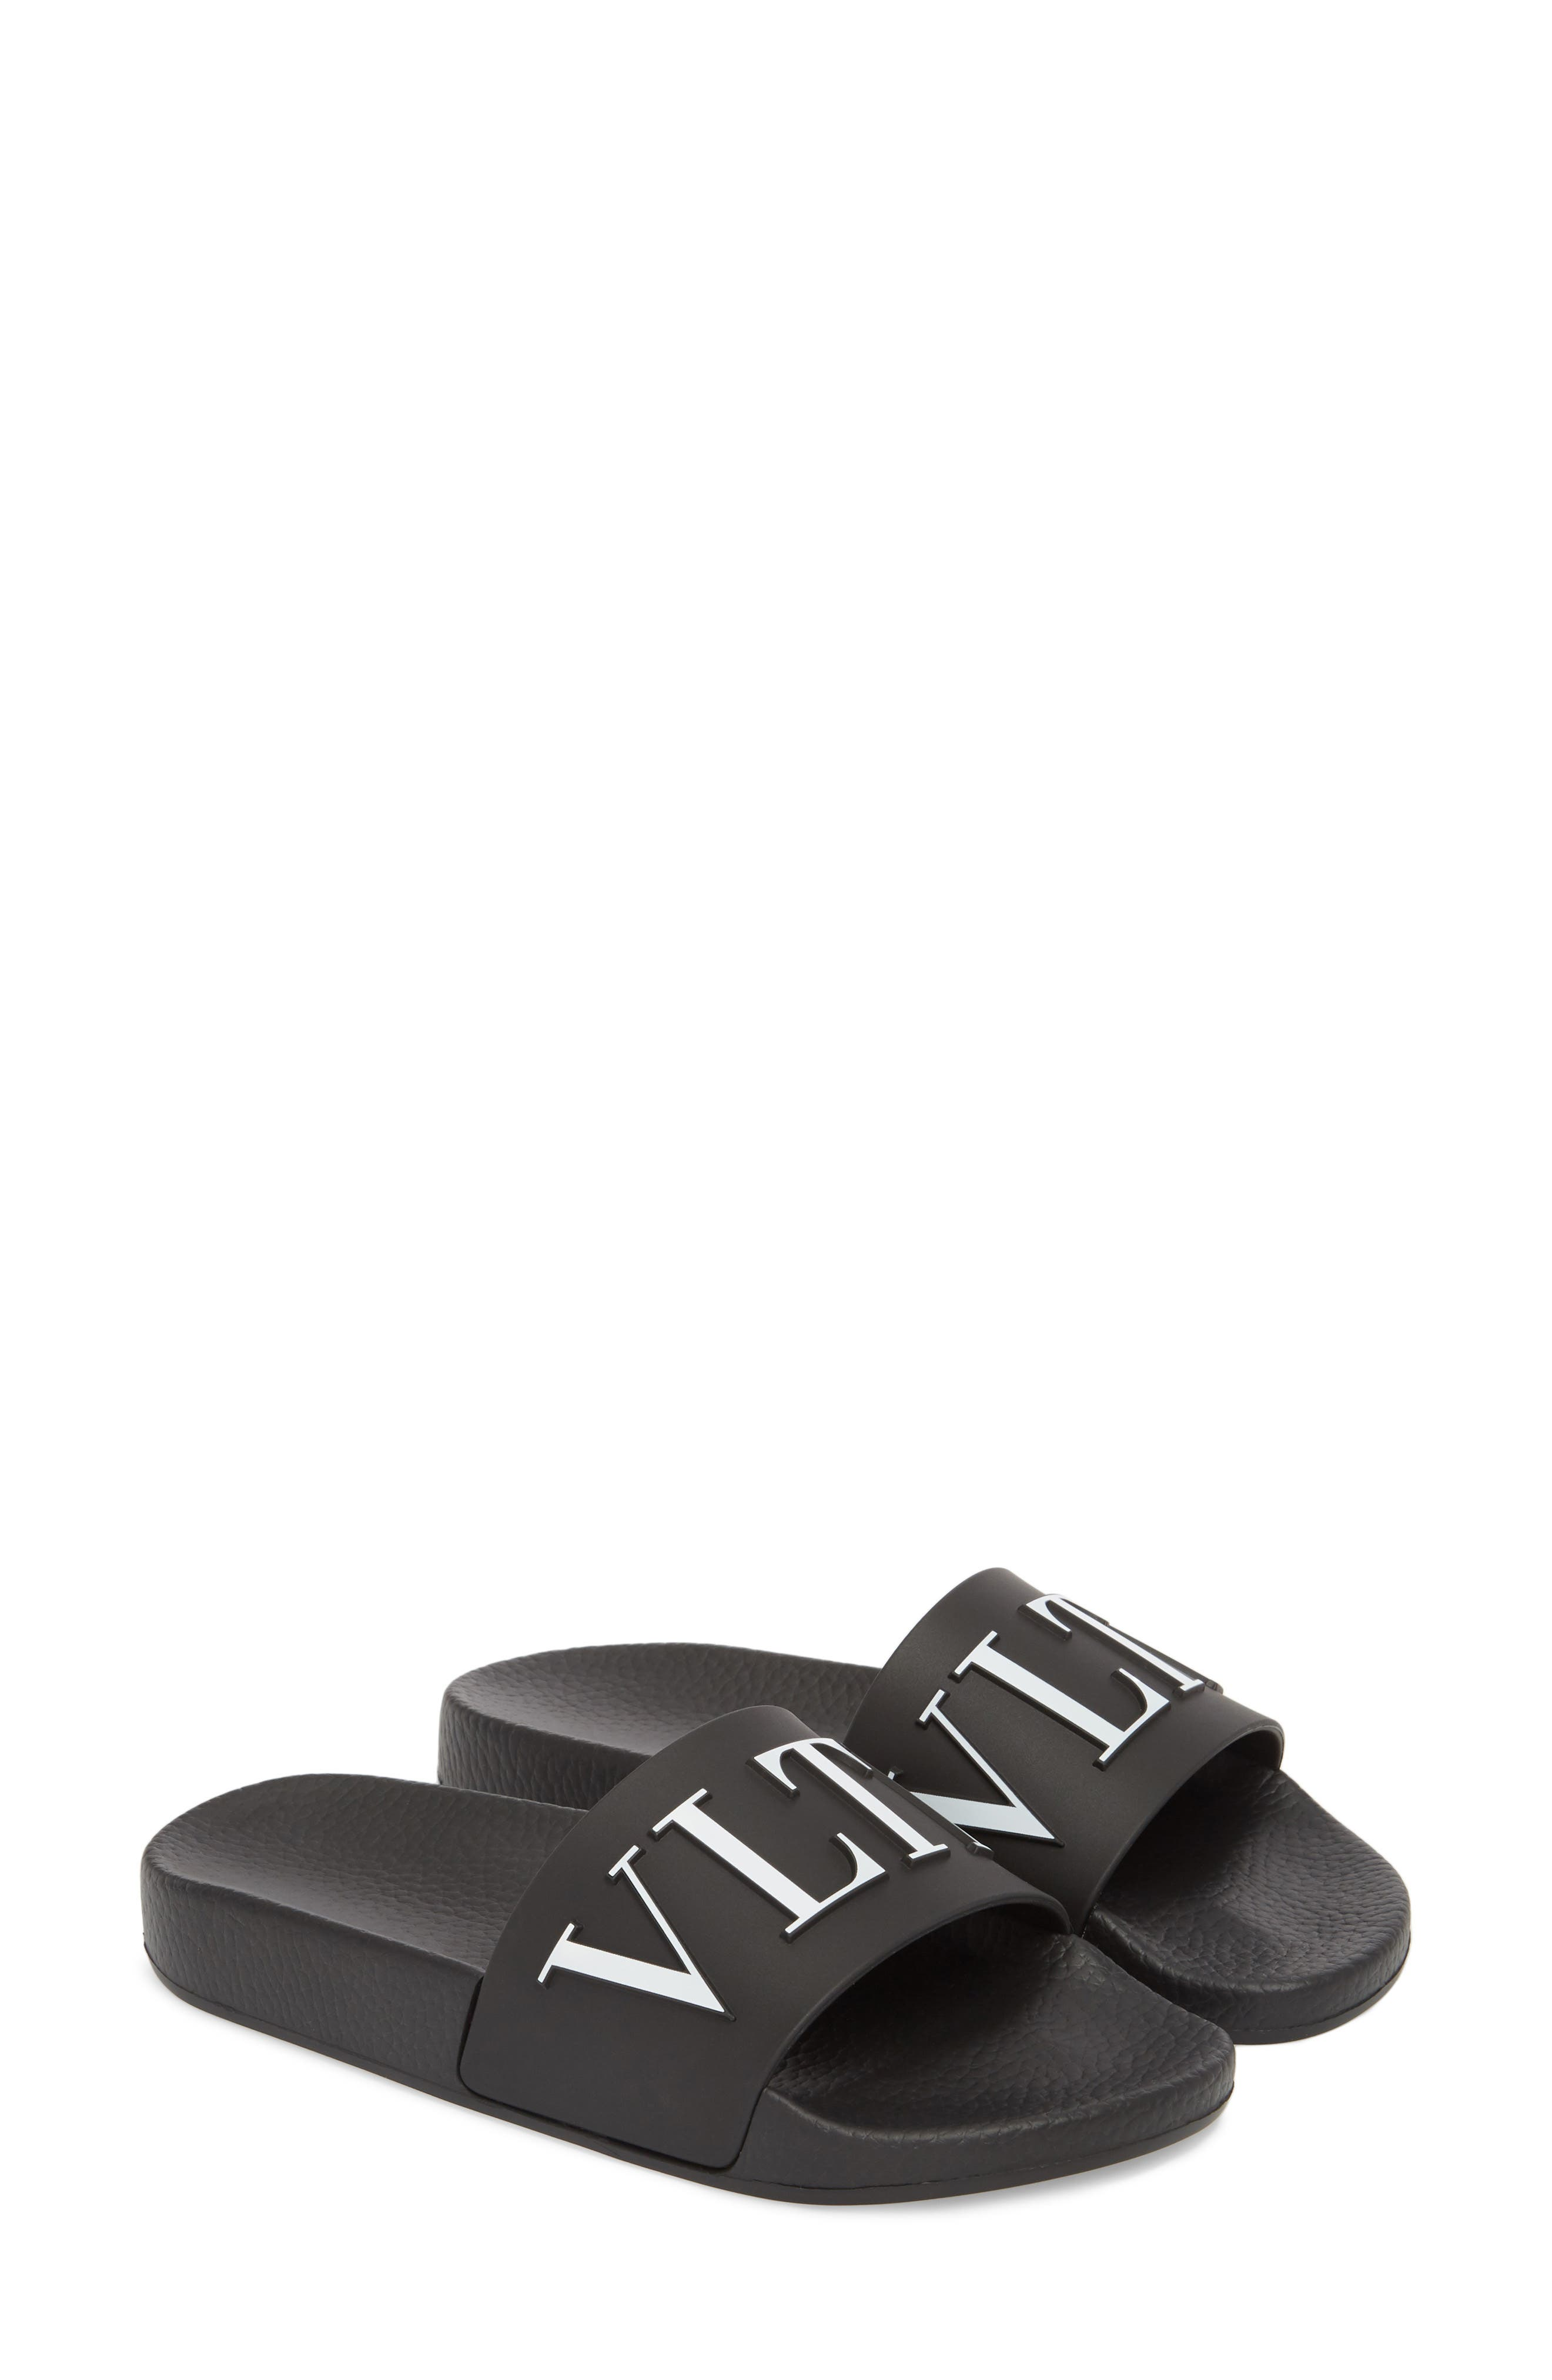 VALENTINO GARAVANI, VLTN Pool Slide Sandal, Main thumbnail 1, color, BLACK/ WHITE